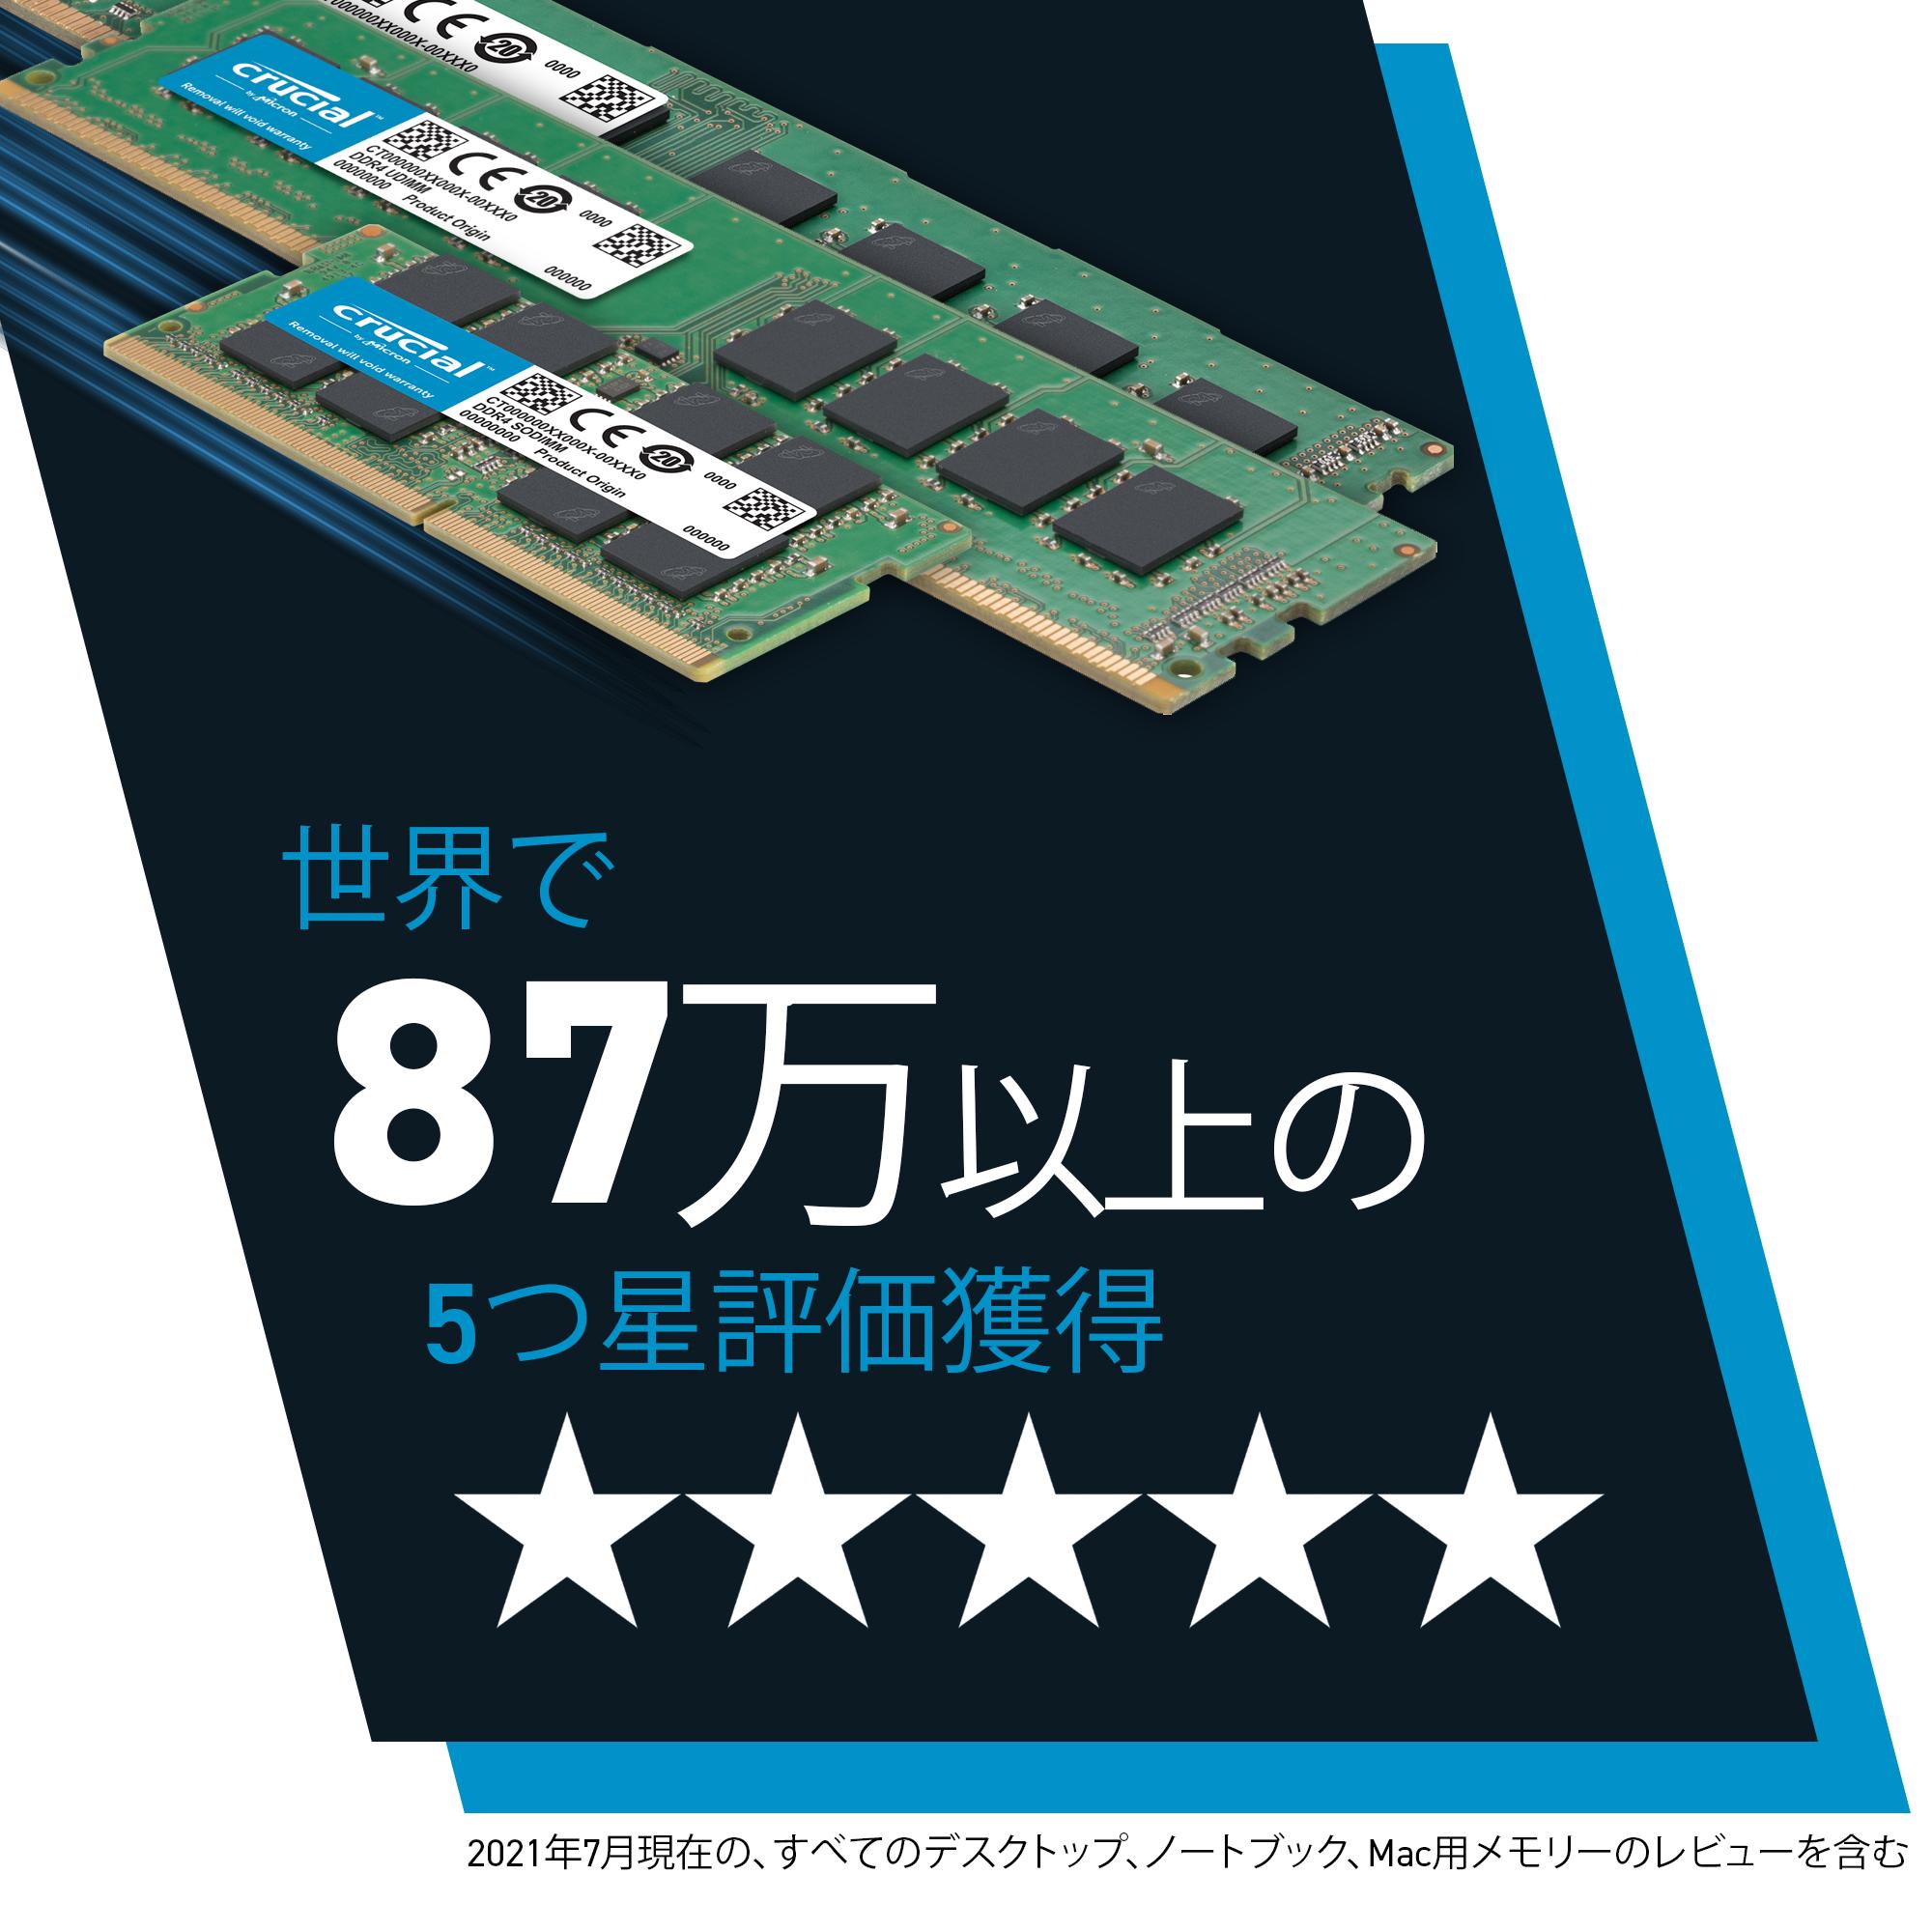 Crucial 32GB Kit (2 x 16GB) DDR4-2666 UDIMM- view 2